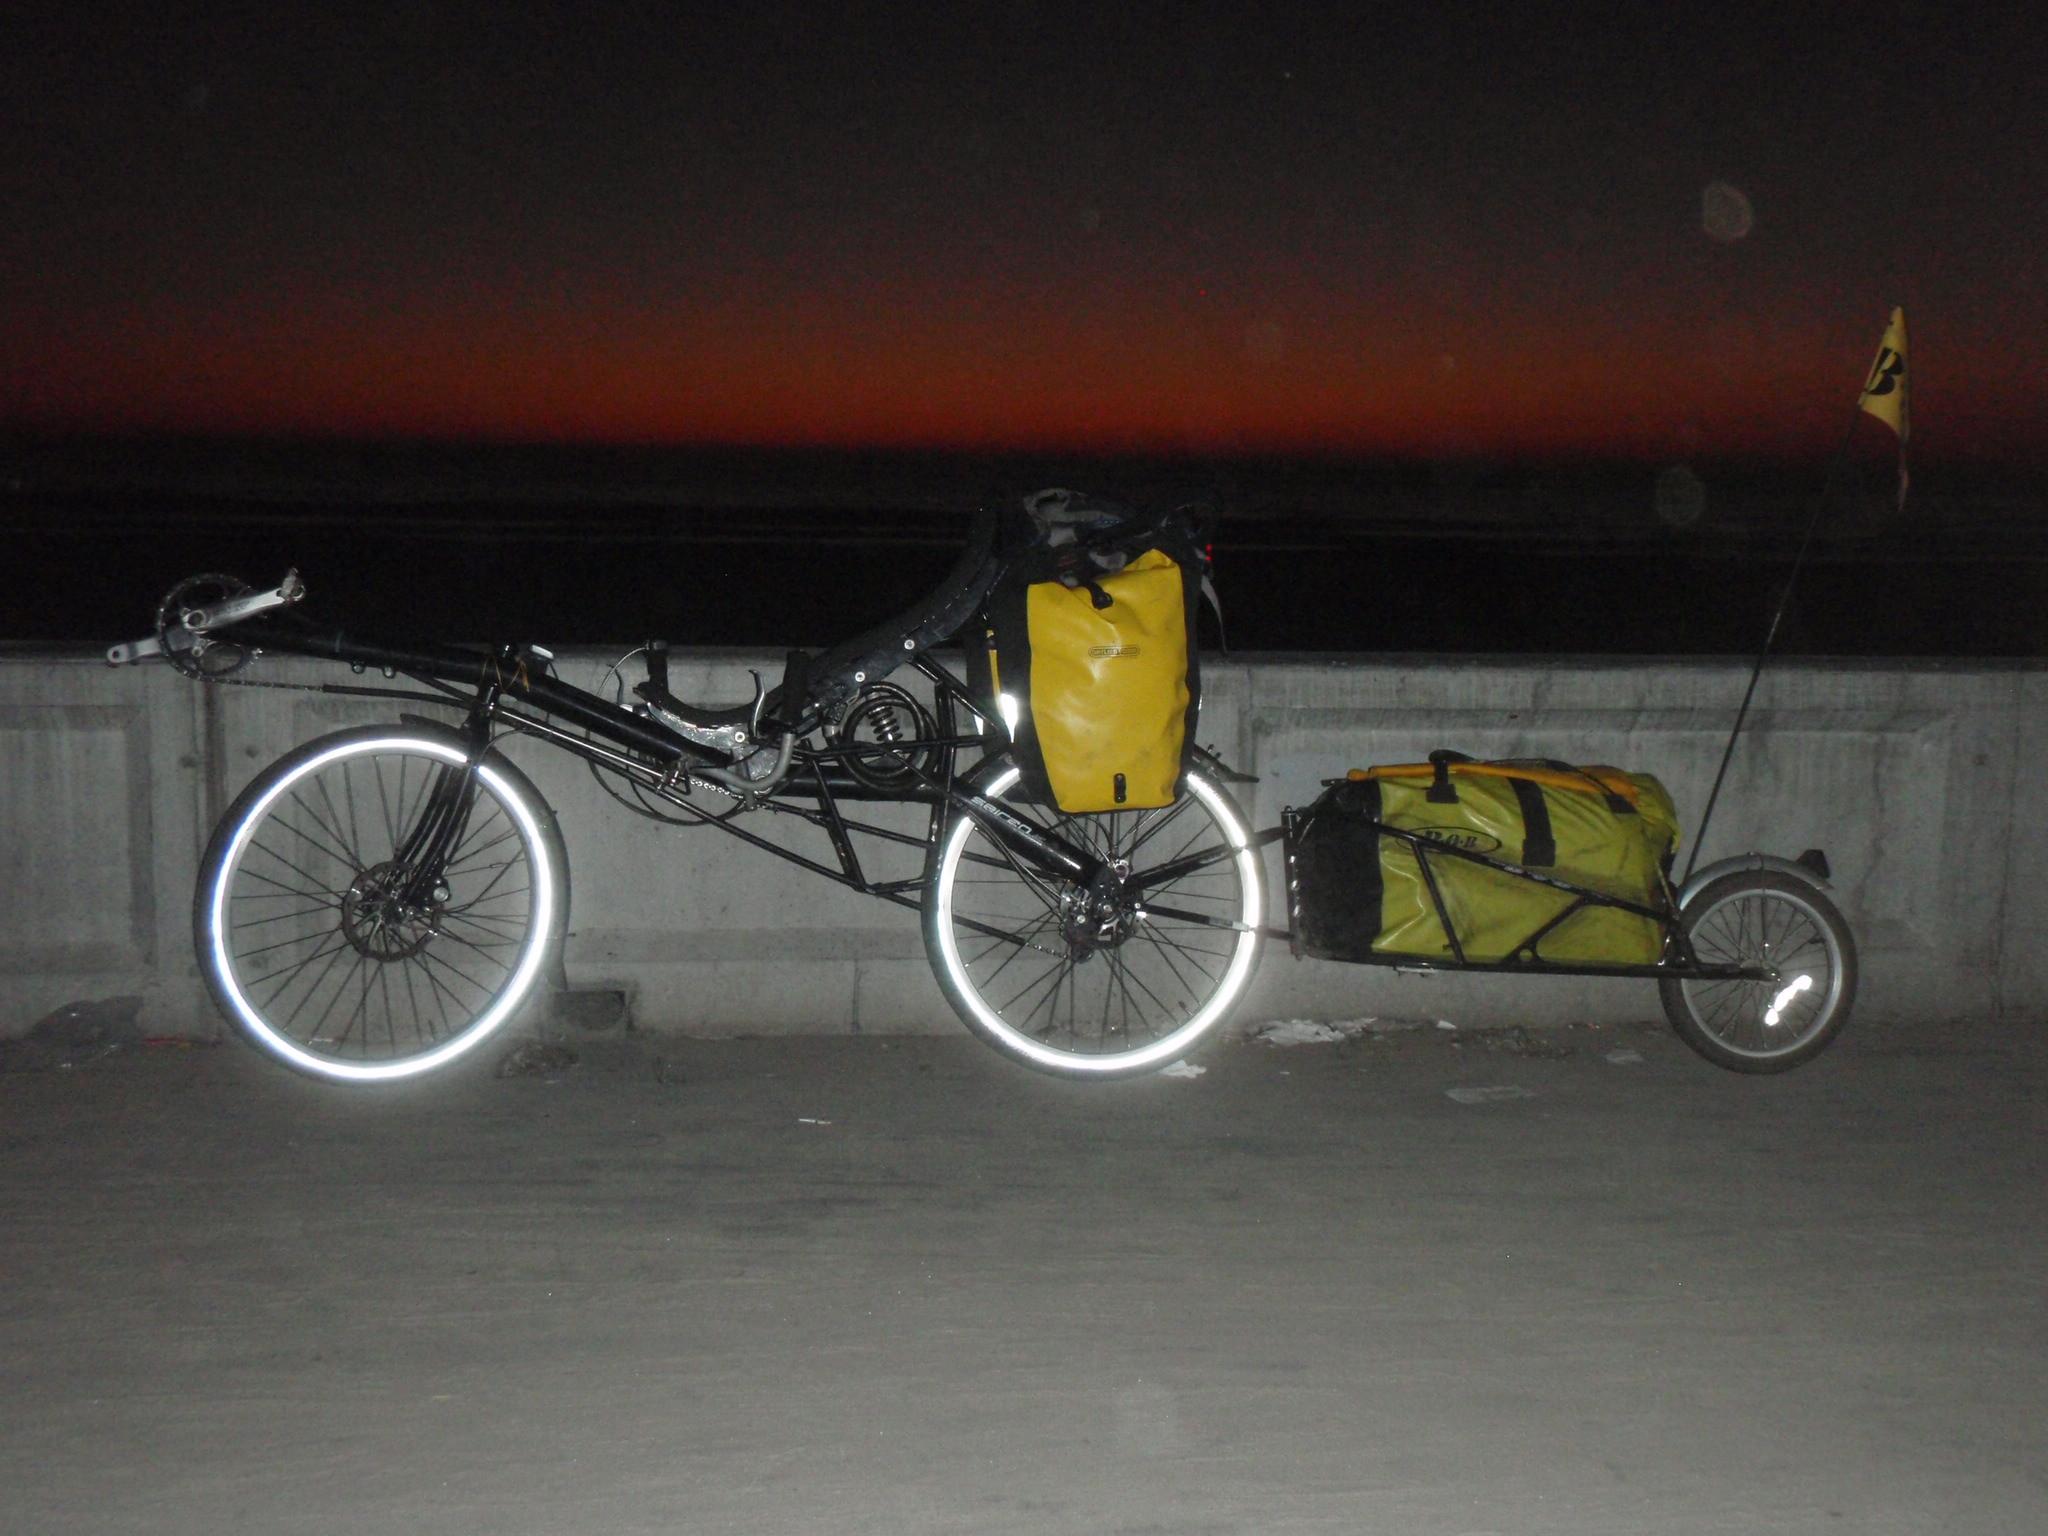 Bike at San Diego beach after dusk